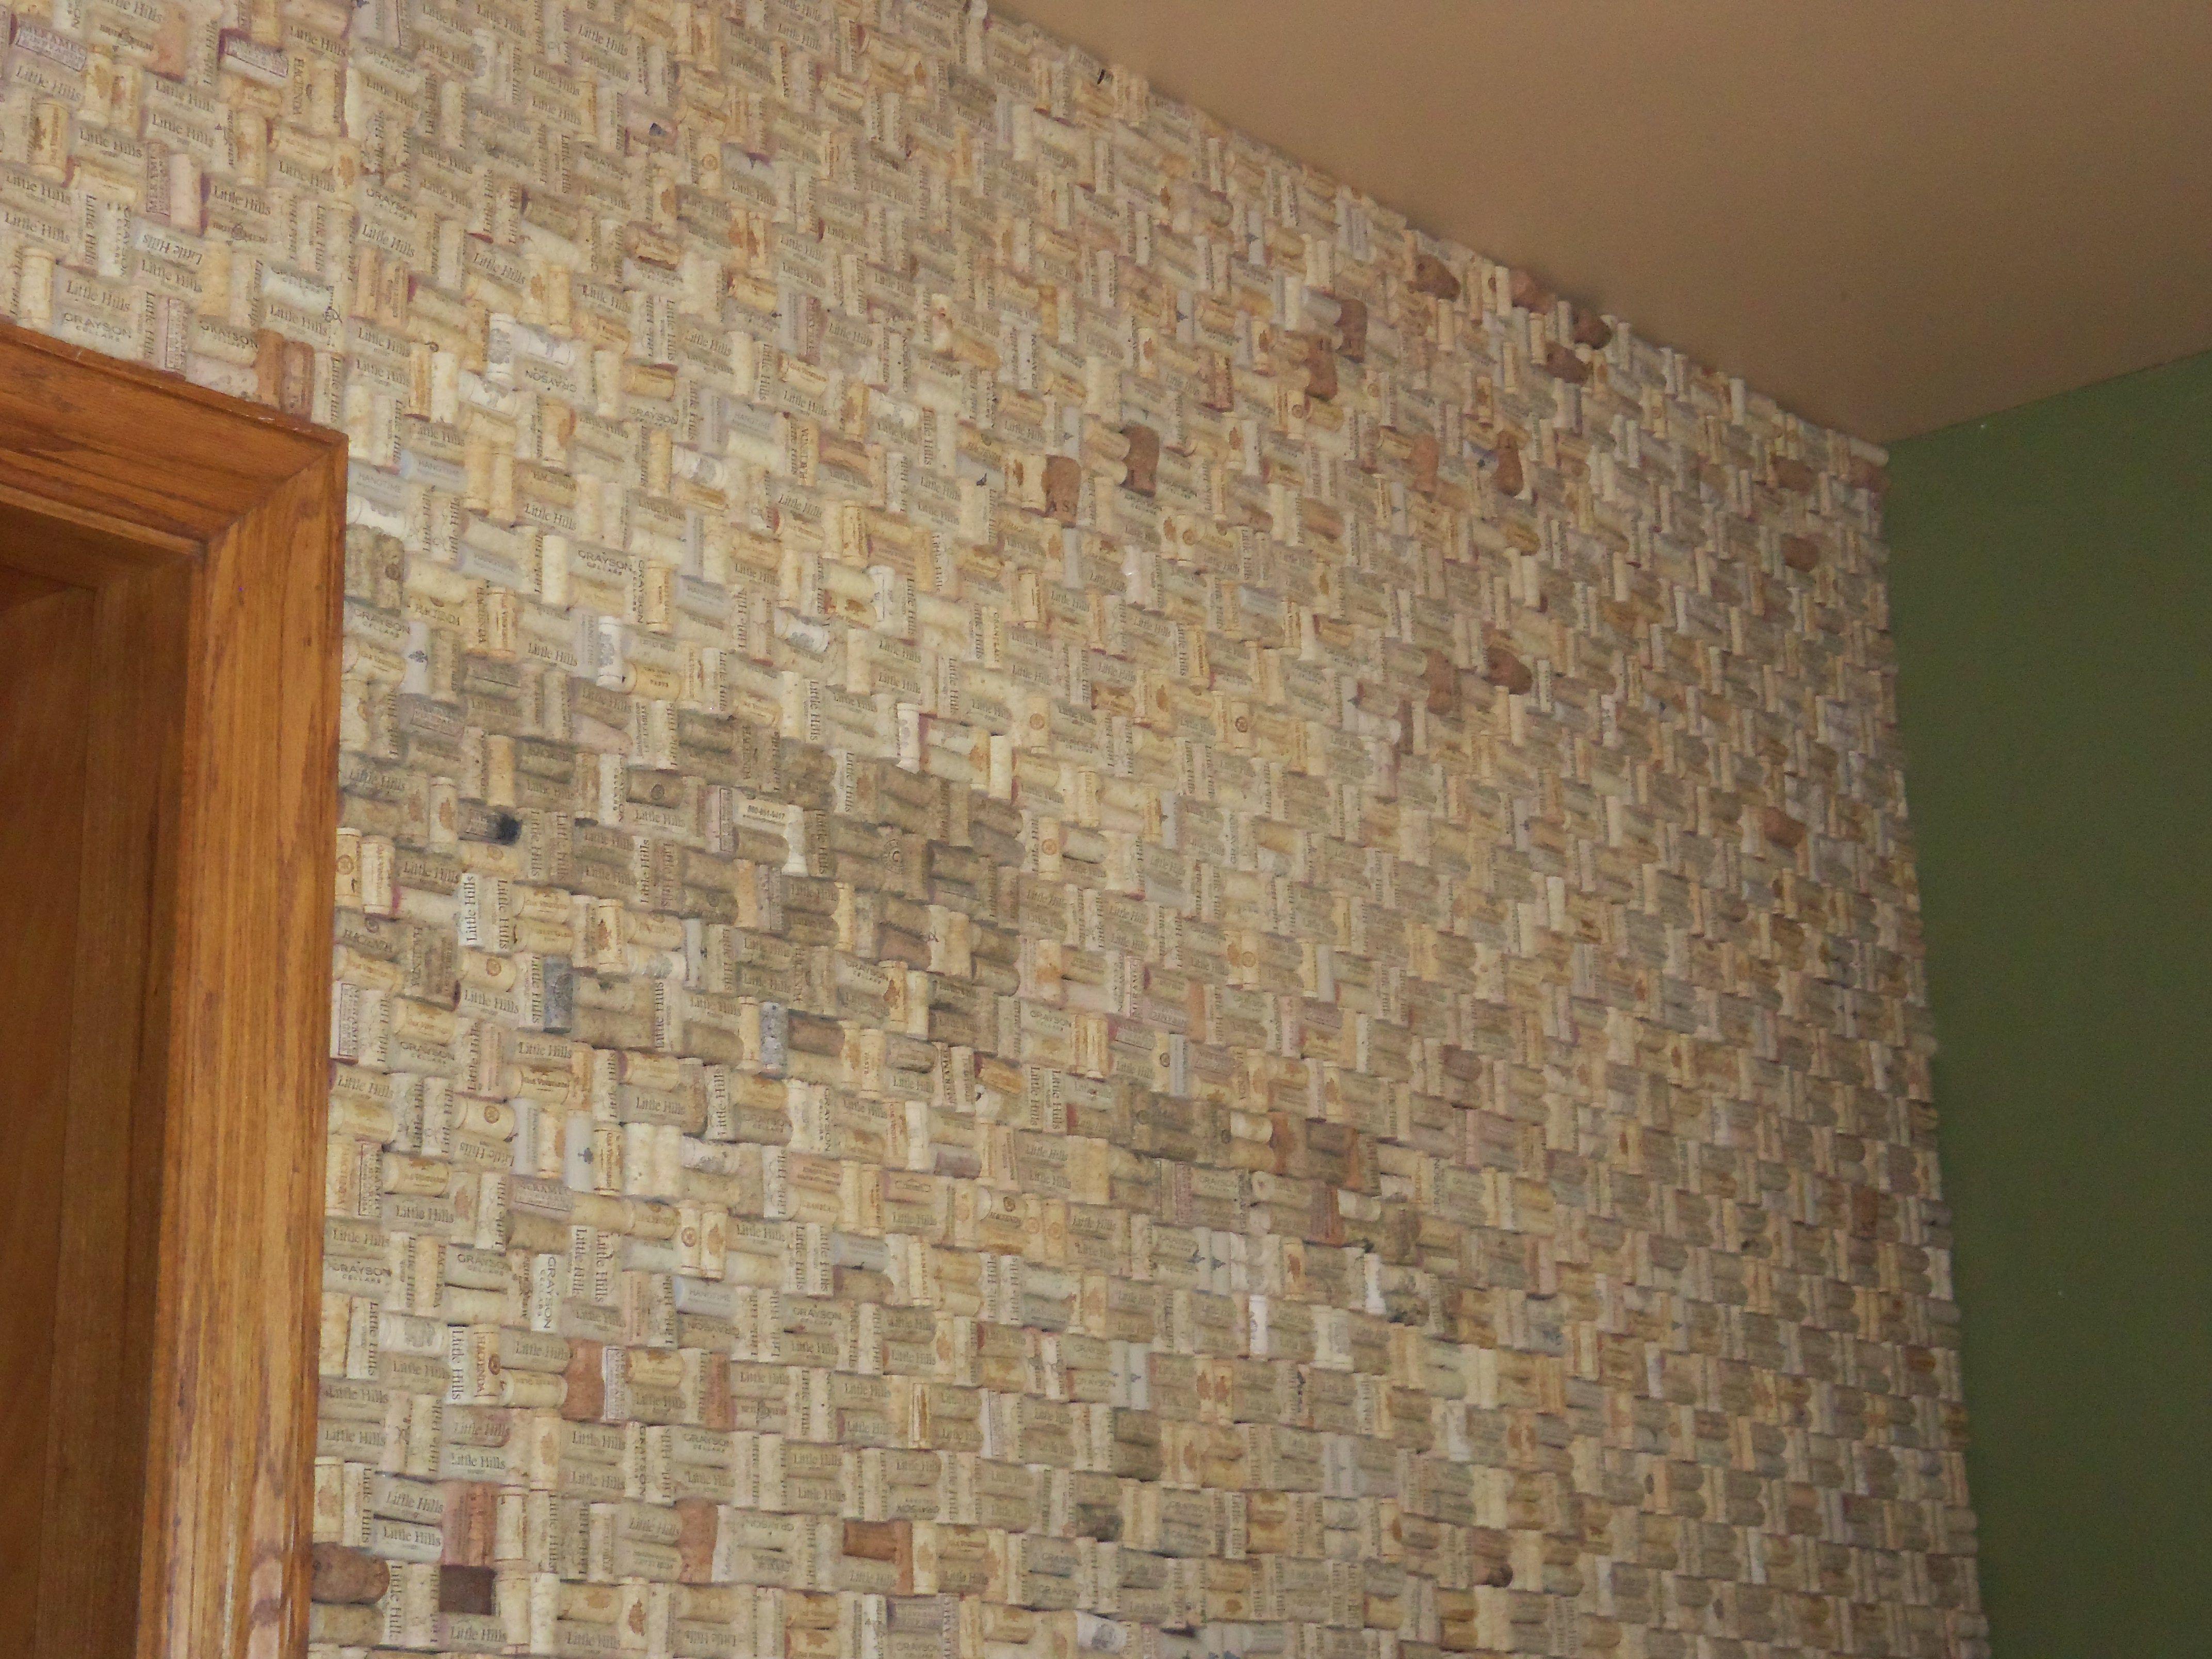 Self stick ceiling tiles